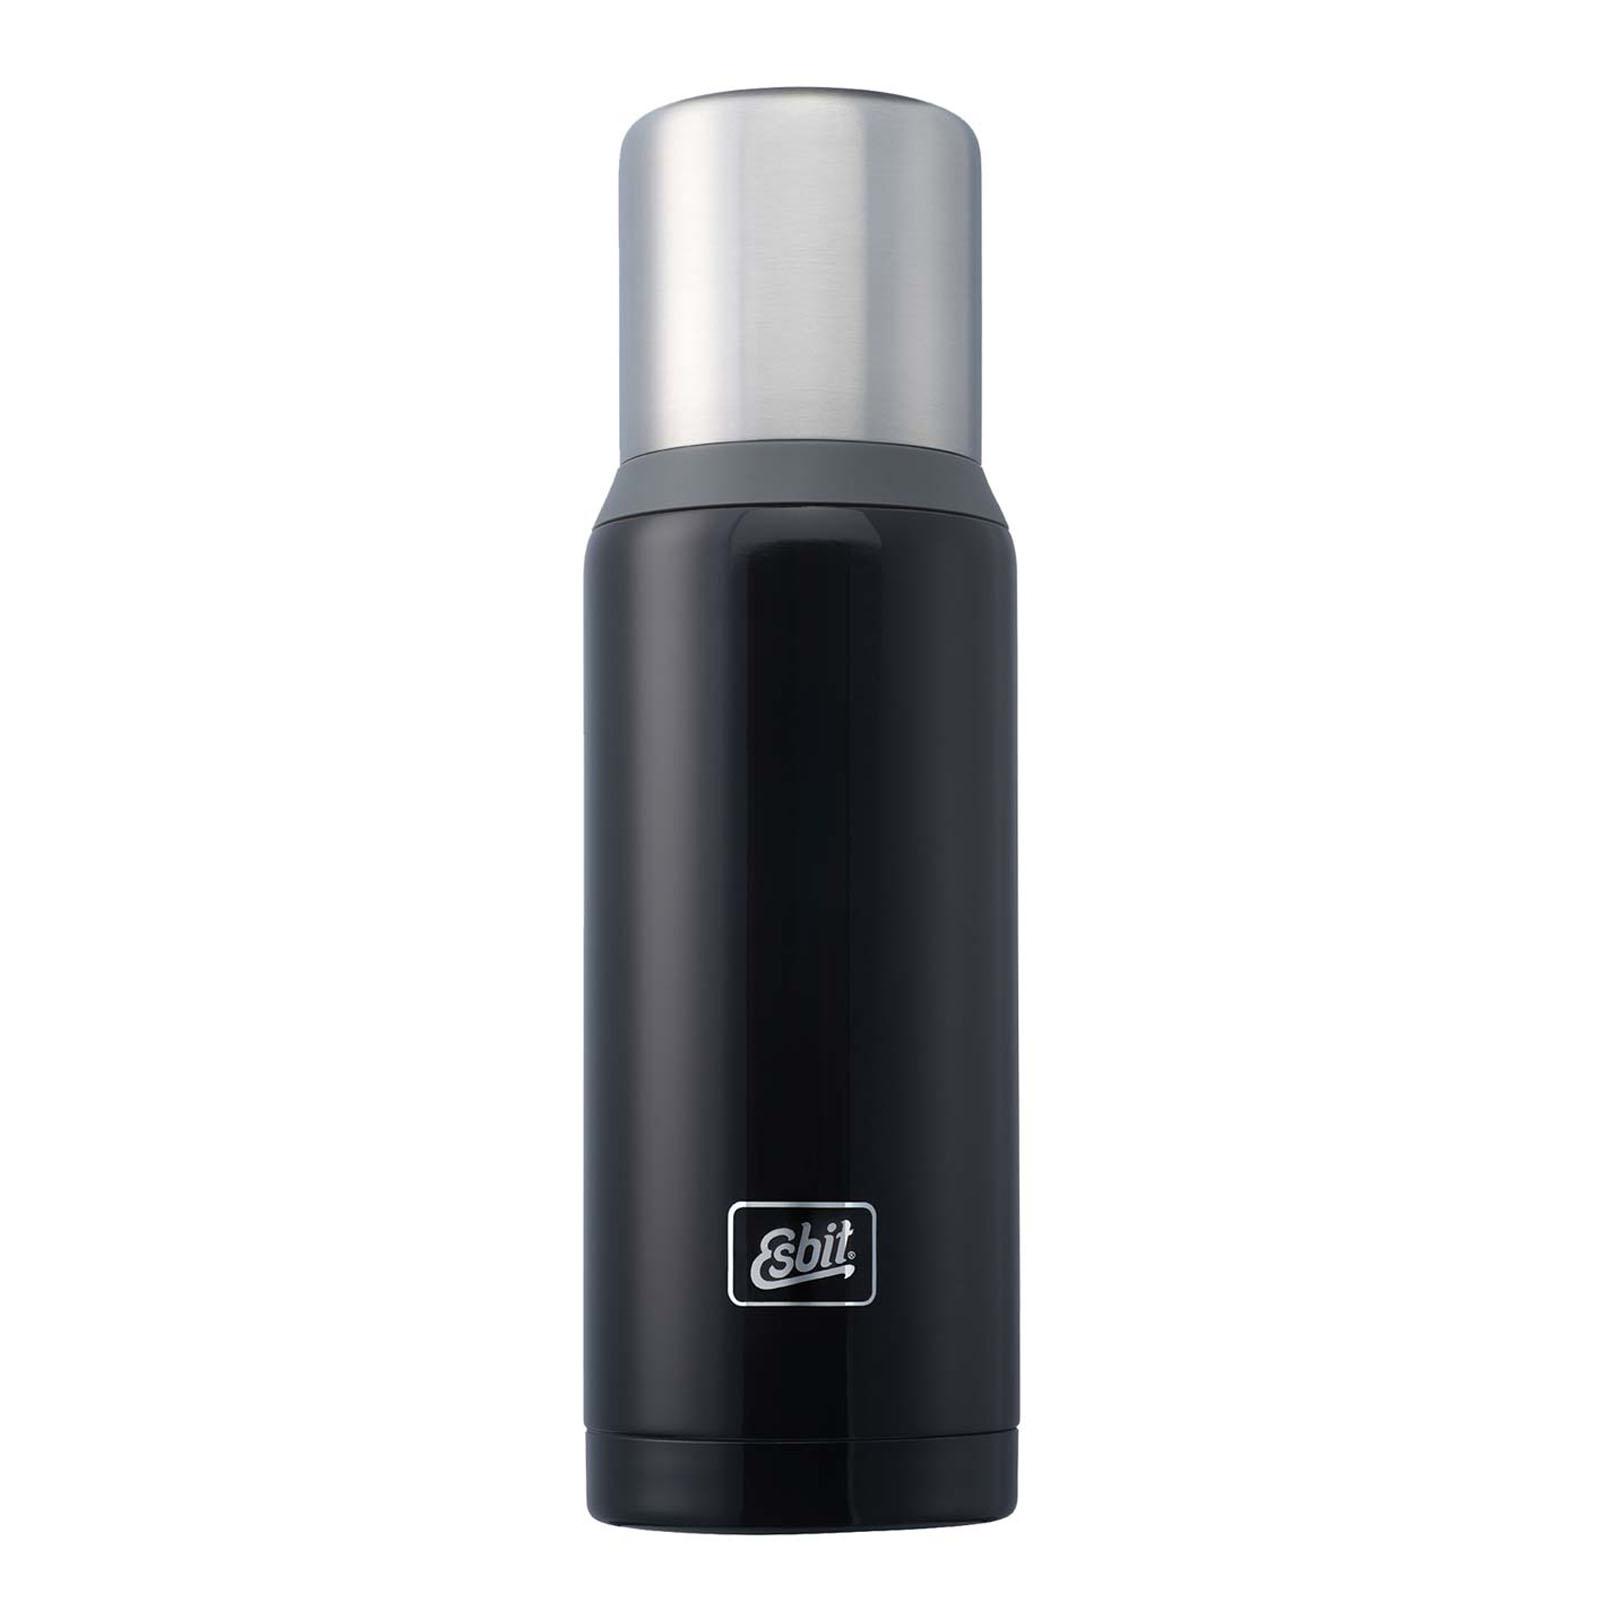 Esbit Stainless Steel Vacuum Flask 1 Litres Black